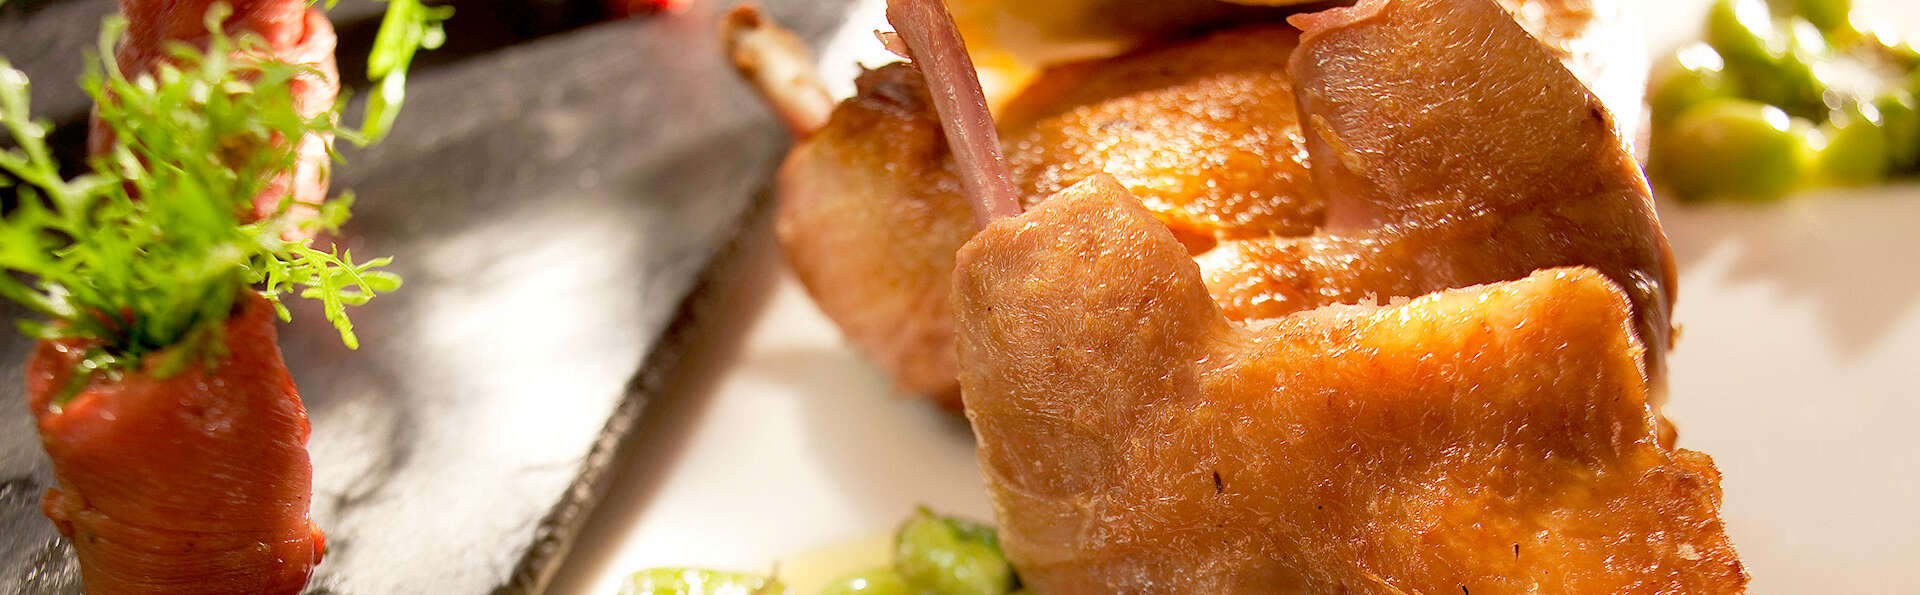 Charme et dîner étoilé en Provence